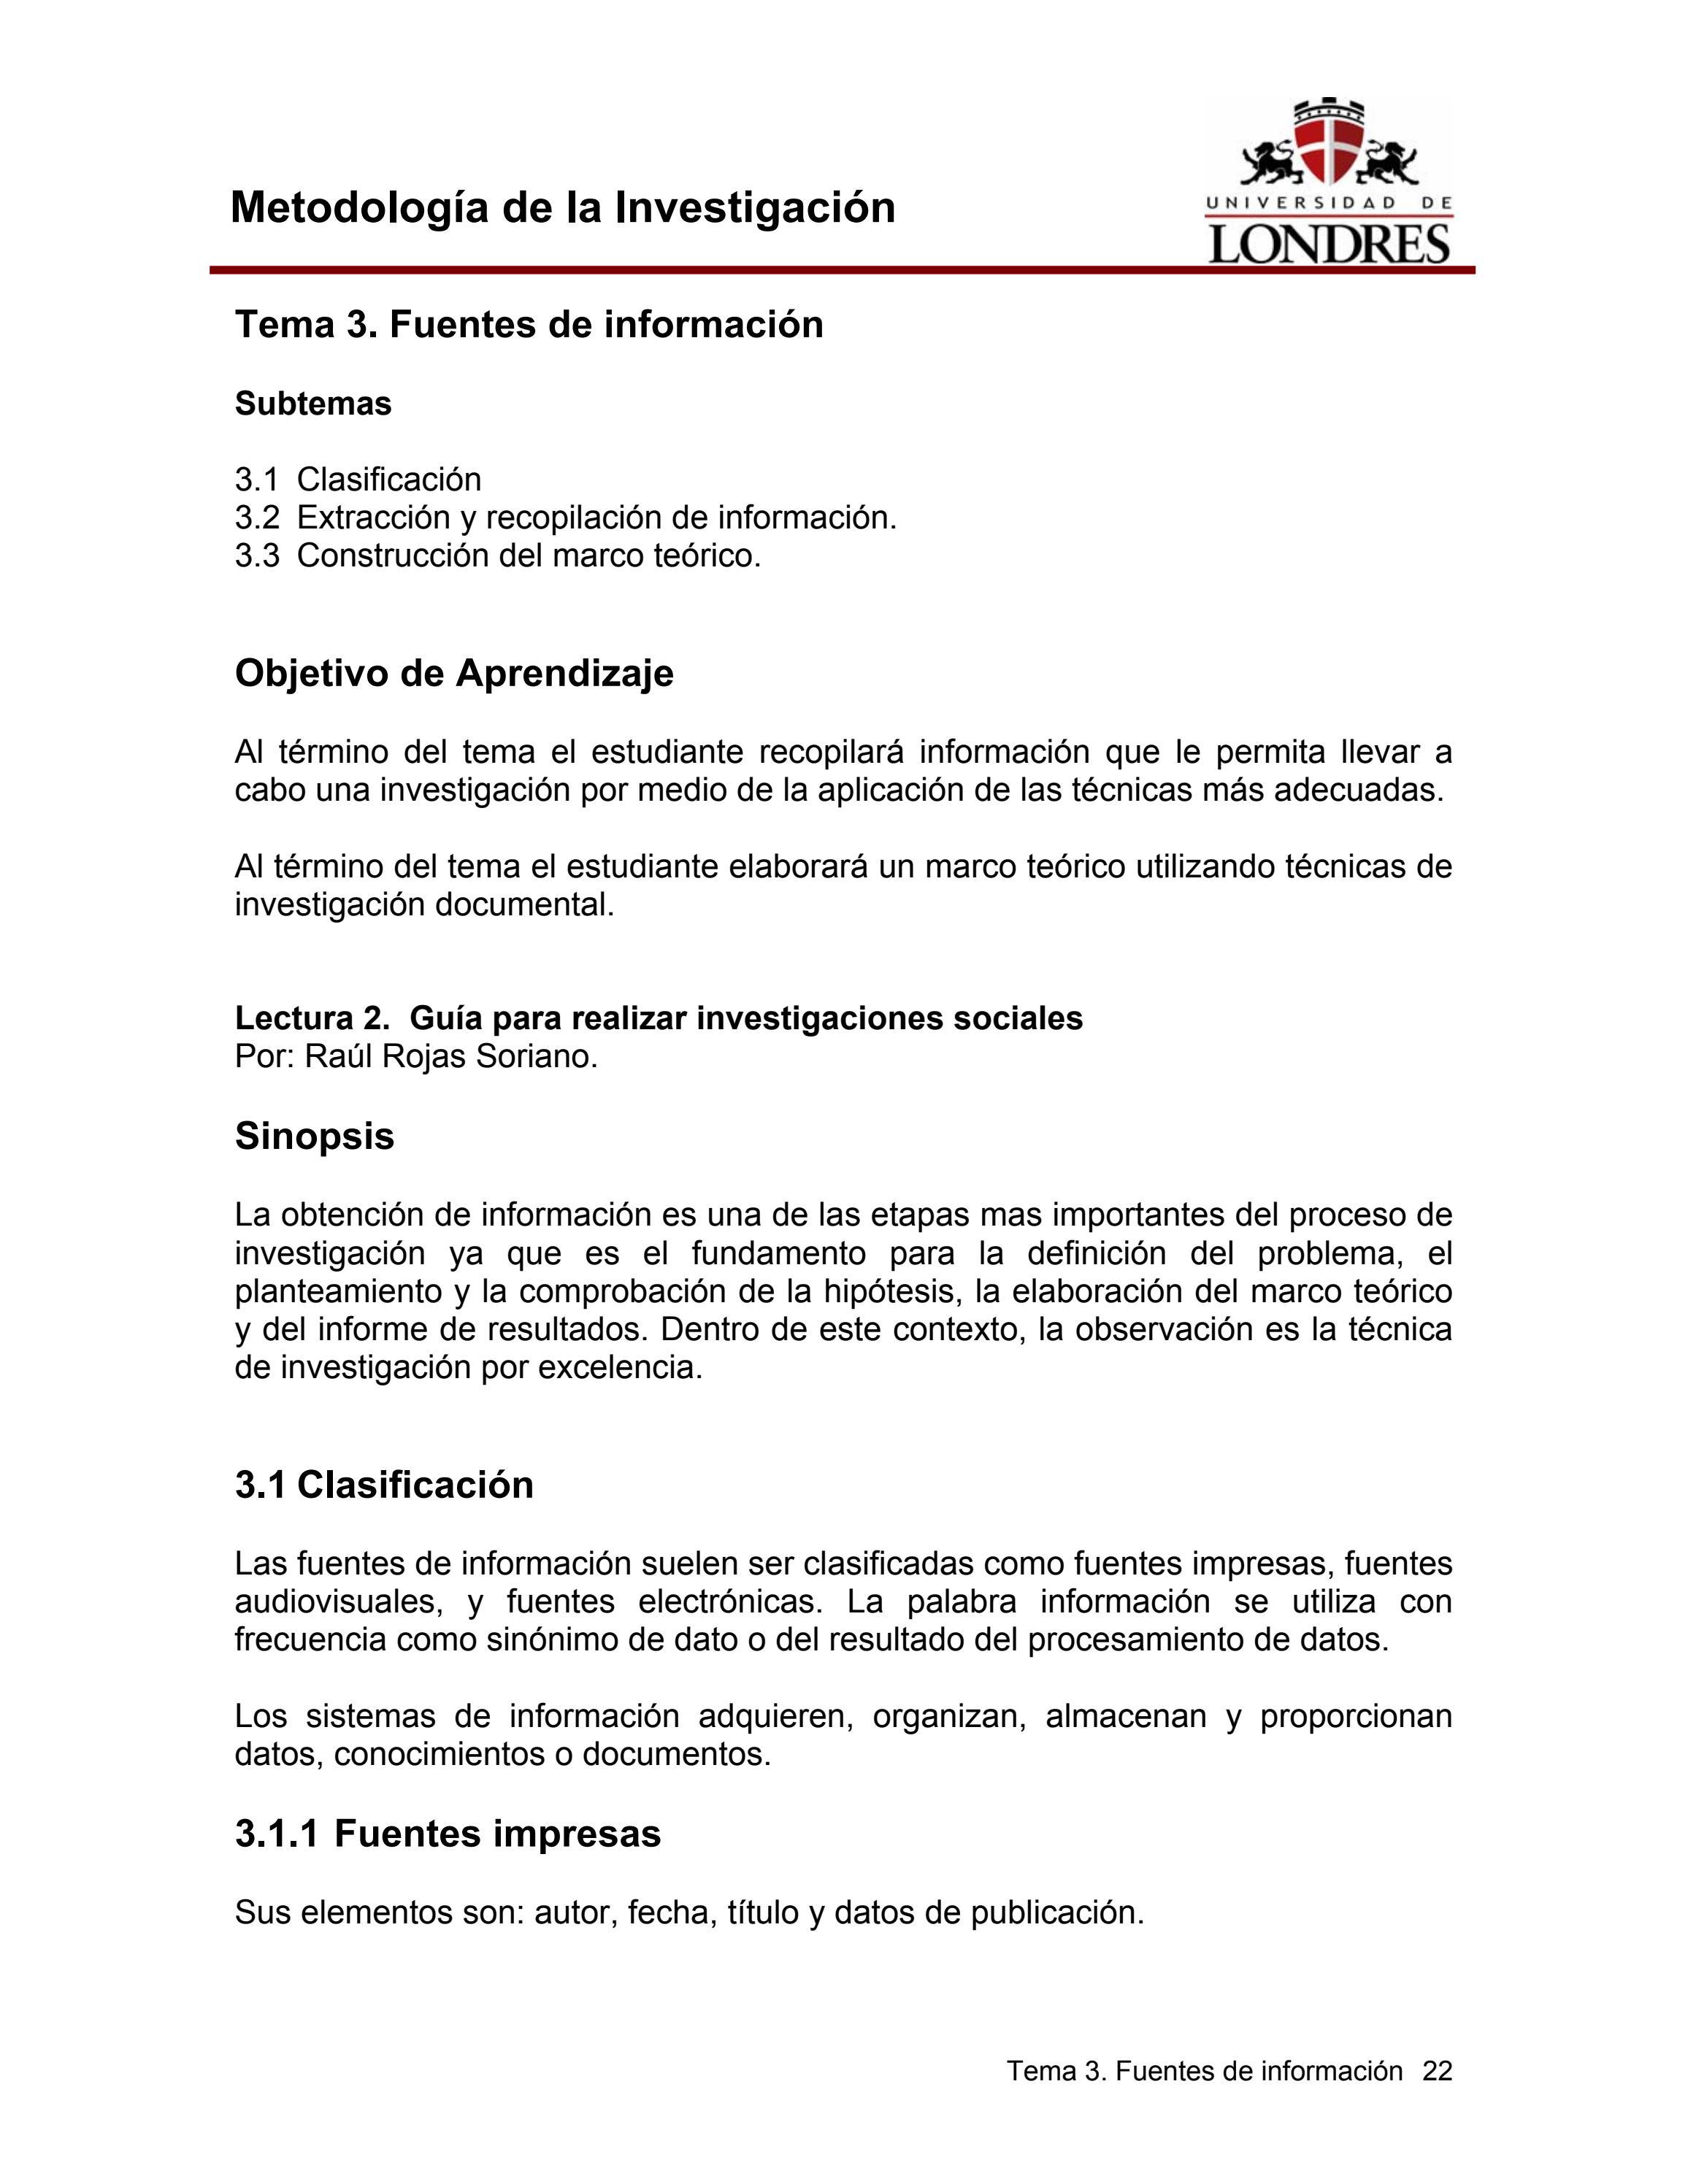 Metodologia investigacion by John Benvin - issuu